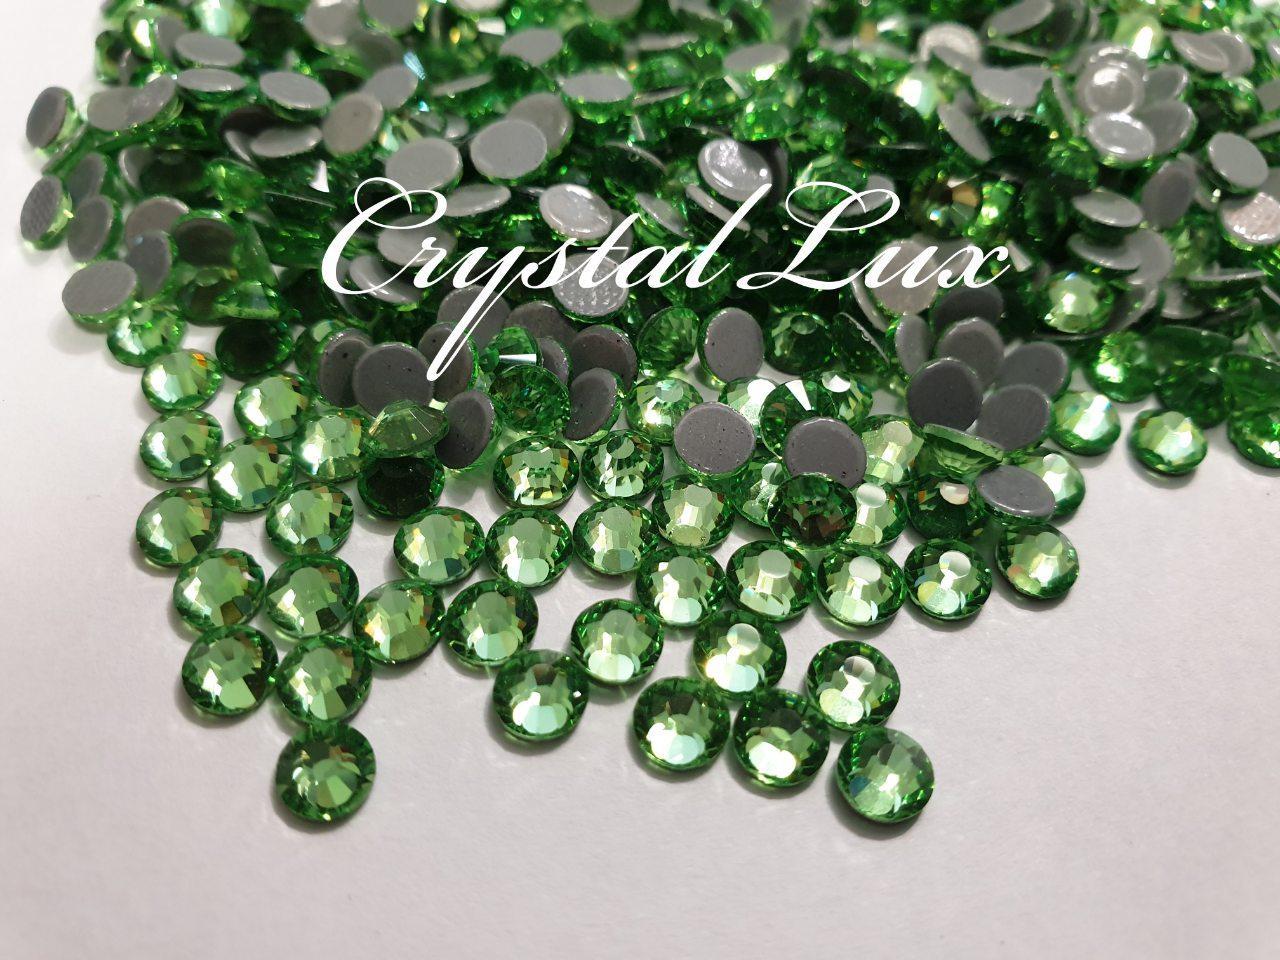 "Термо-стразы ss16 Peridot, 1440шт, (3,8-4,0мм) ""Crystal Premium"""